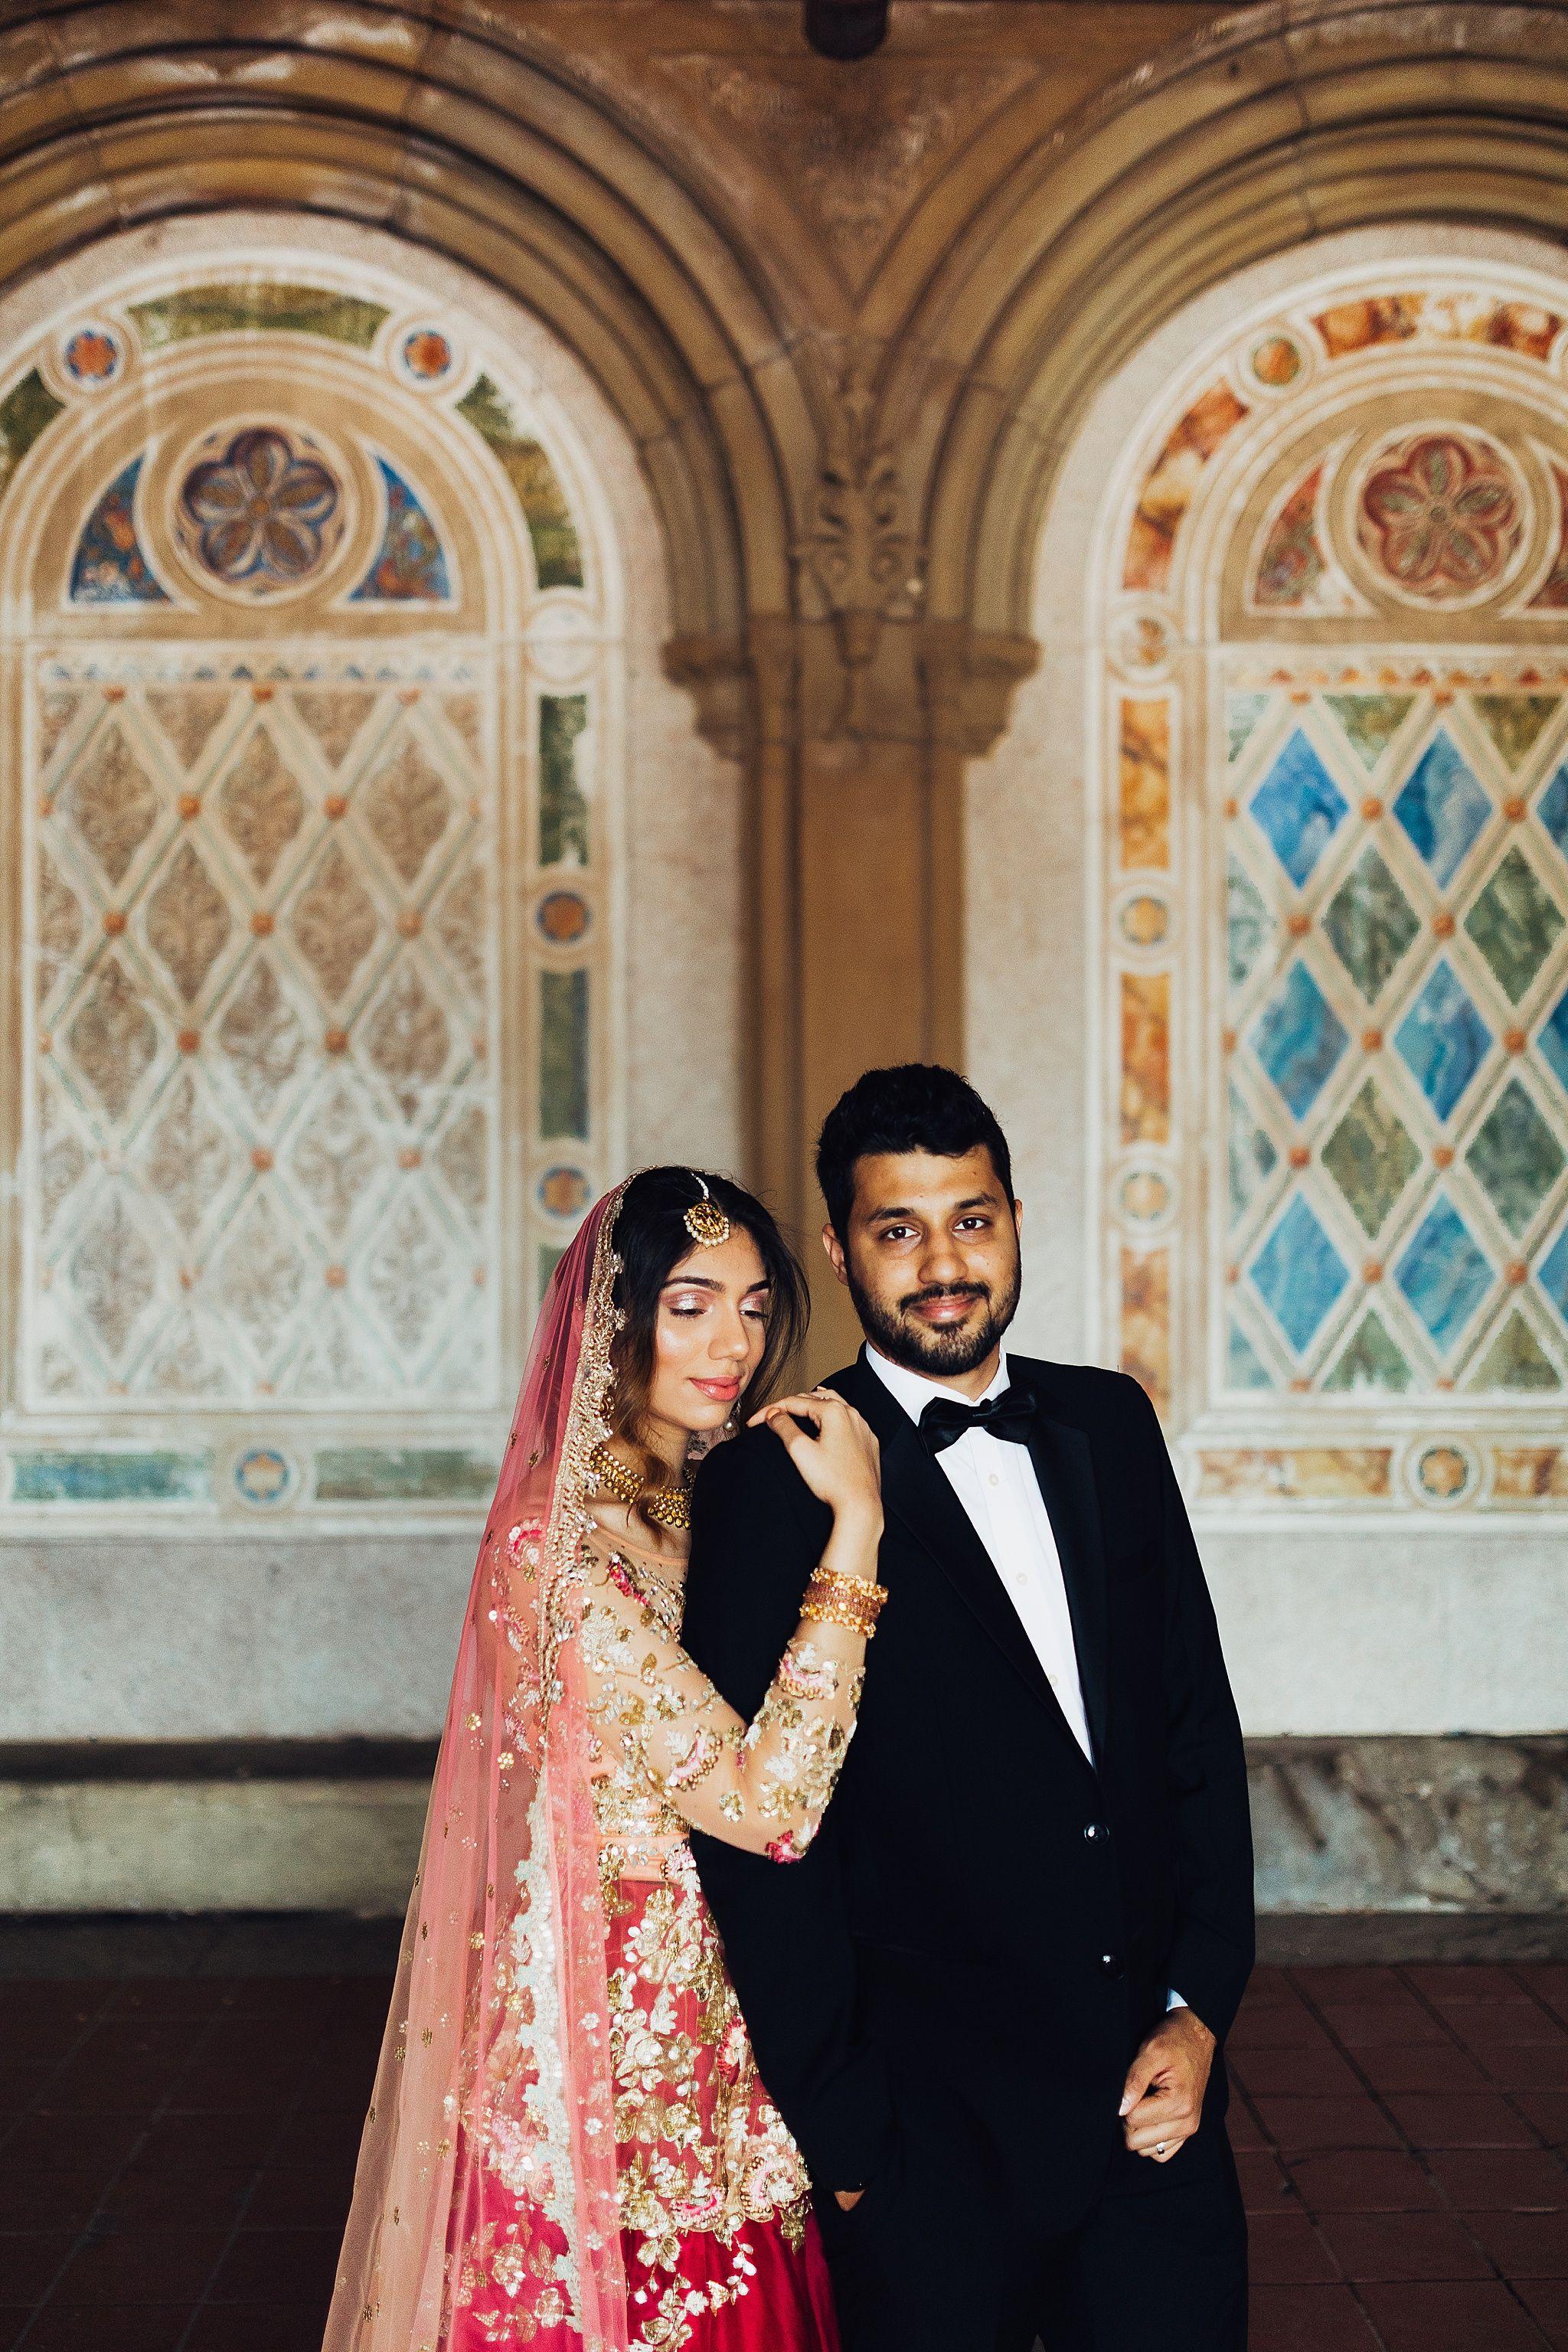 Jamal Sanah Nyc Central Park Indian Wedding Wedding Photography Bride Indian Wedding Photographer Indian Wedding Couple